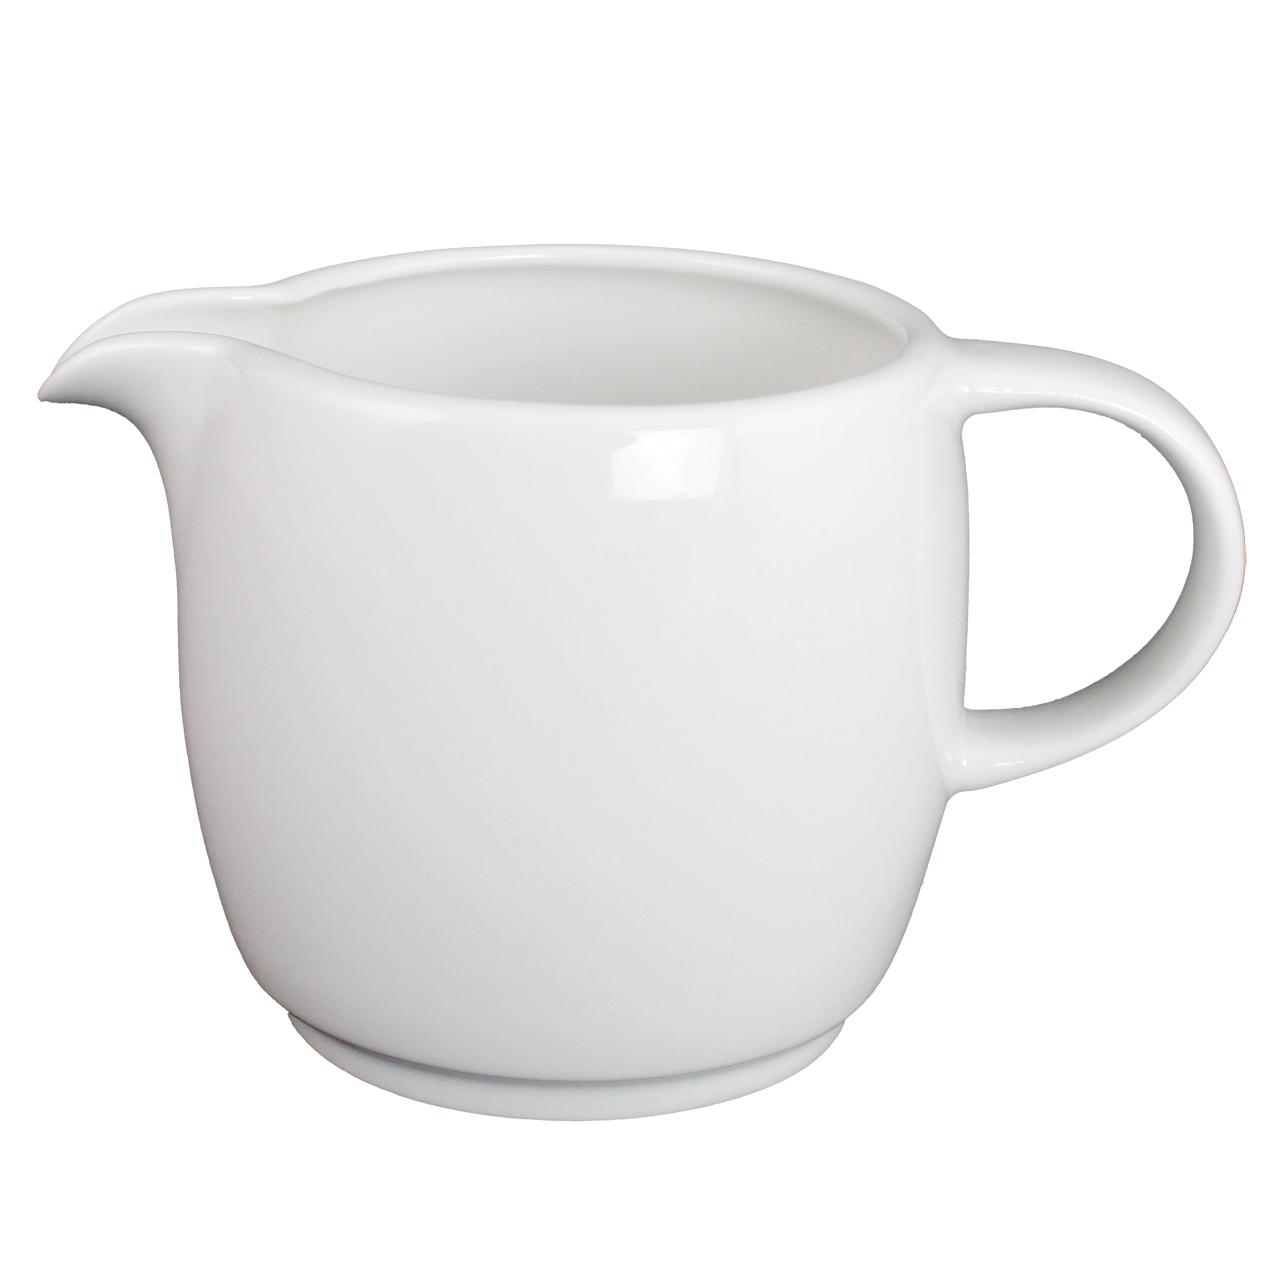 Cana Din Ceramica Alba